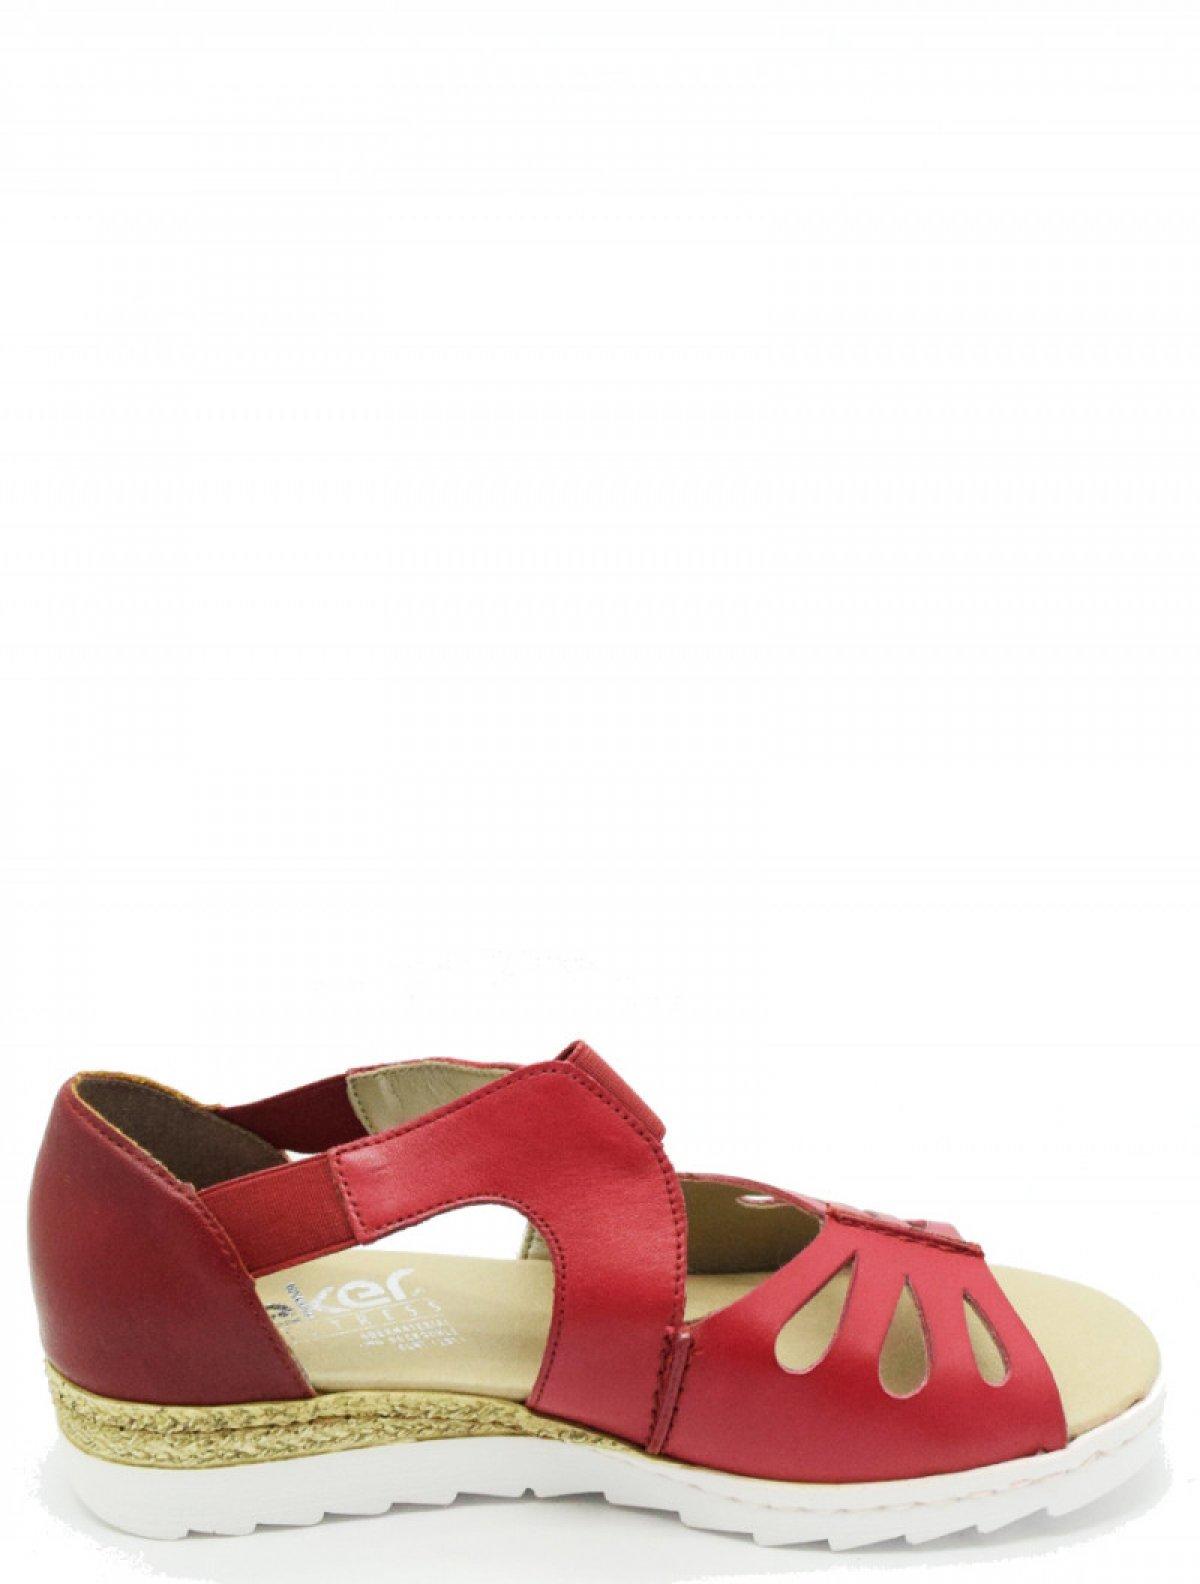 Rieker 63004-33 женские сандали